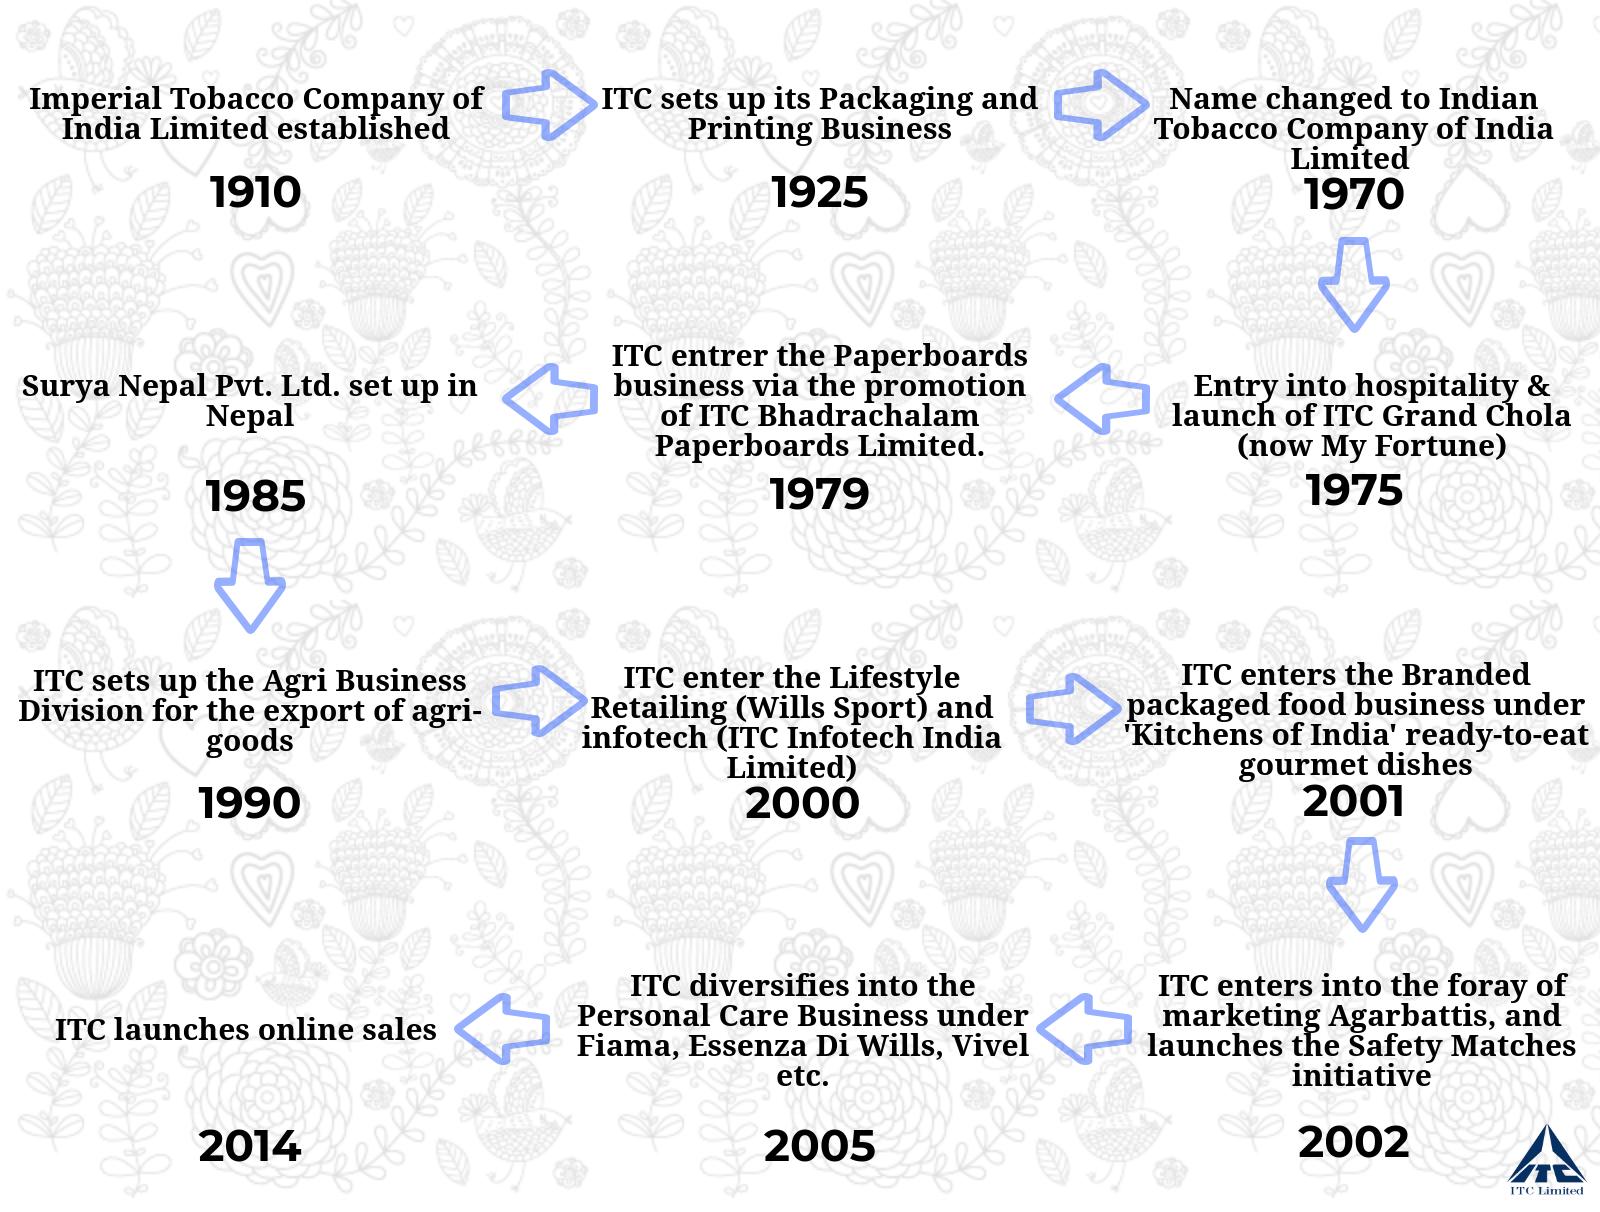 history of ITC